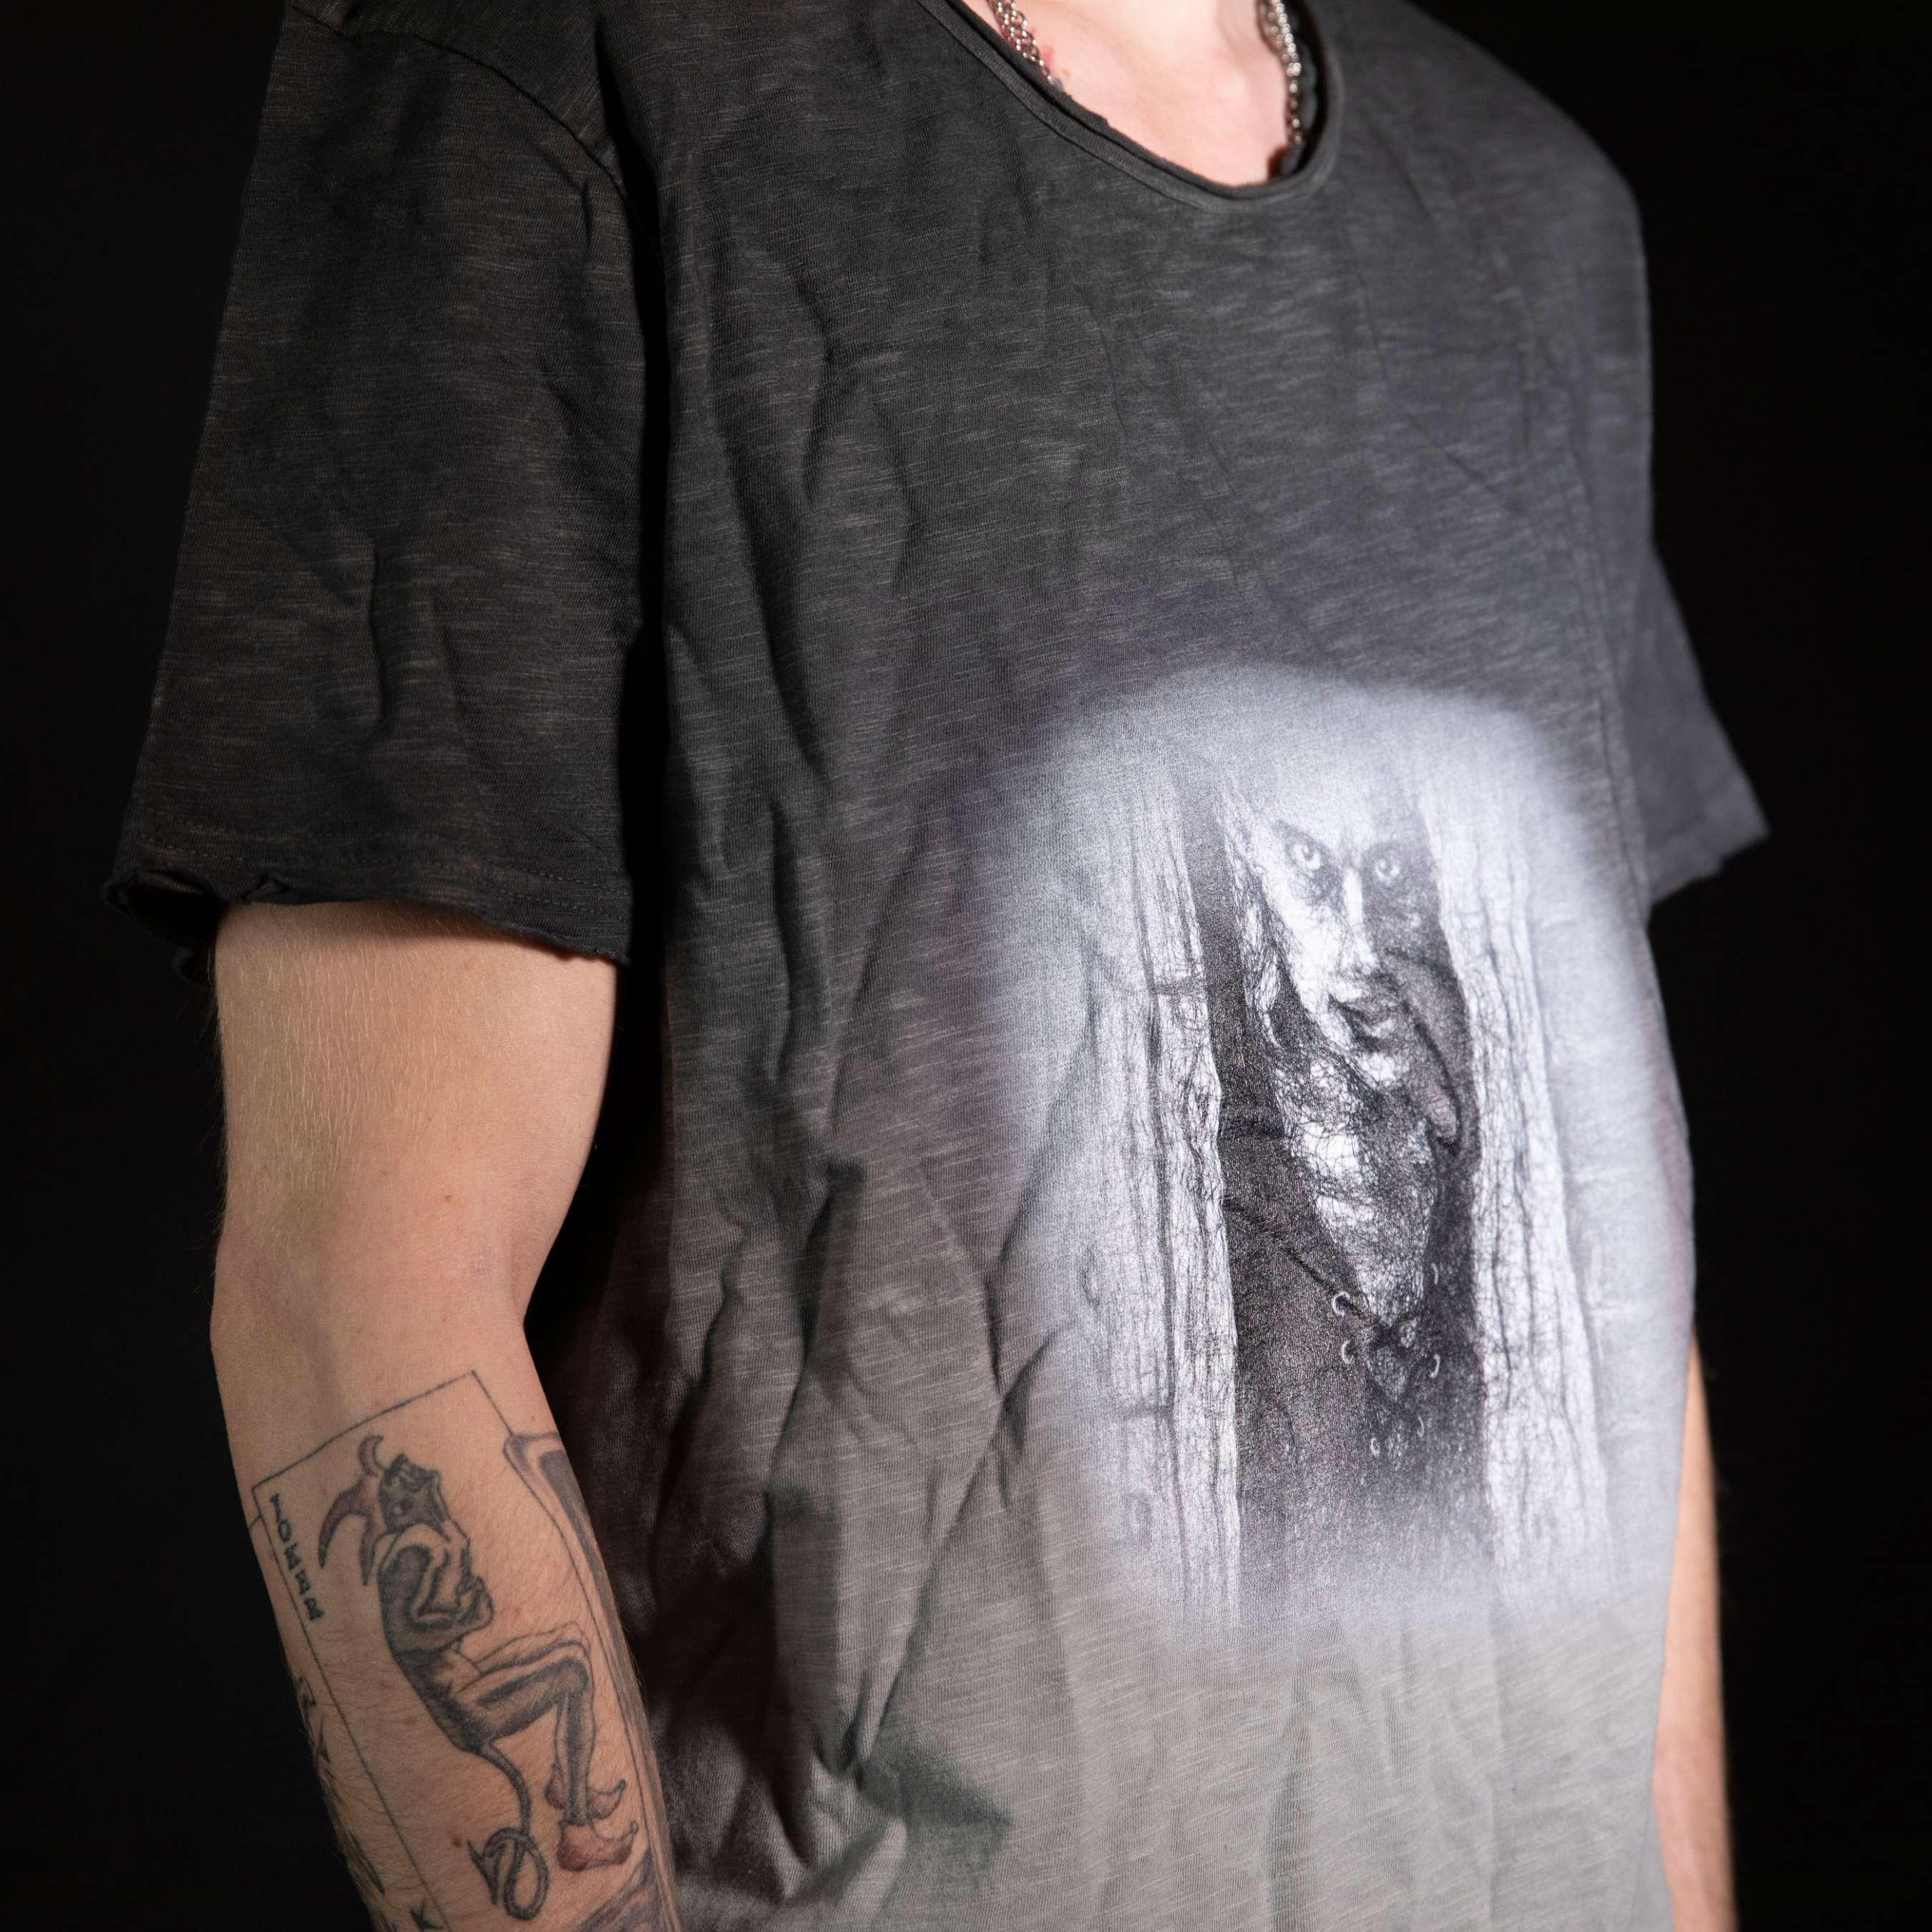 michael-stauner-merchandise-scene-tabor-shirt-man.jpg